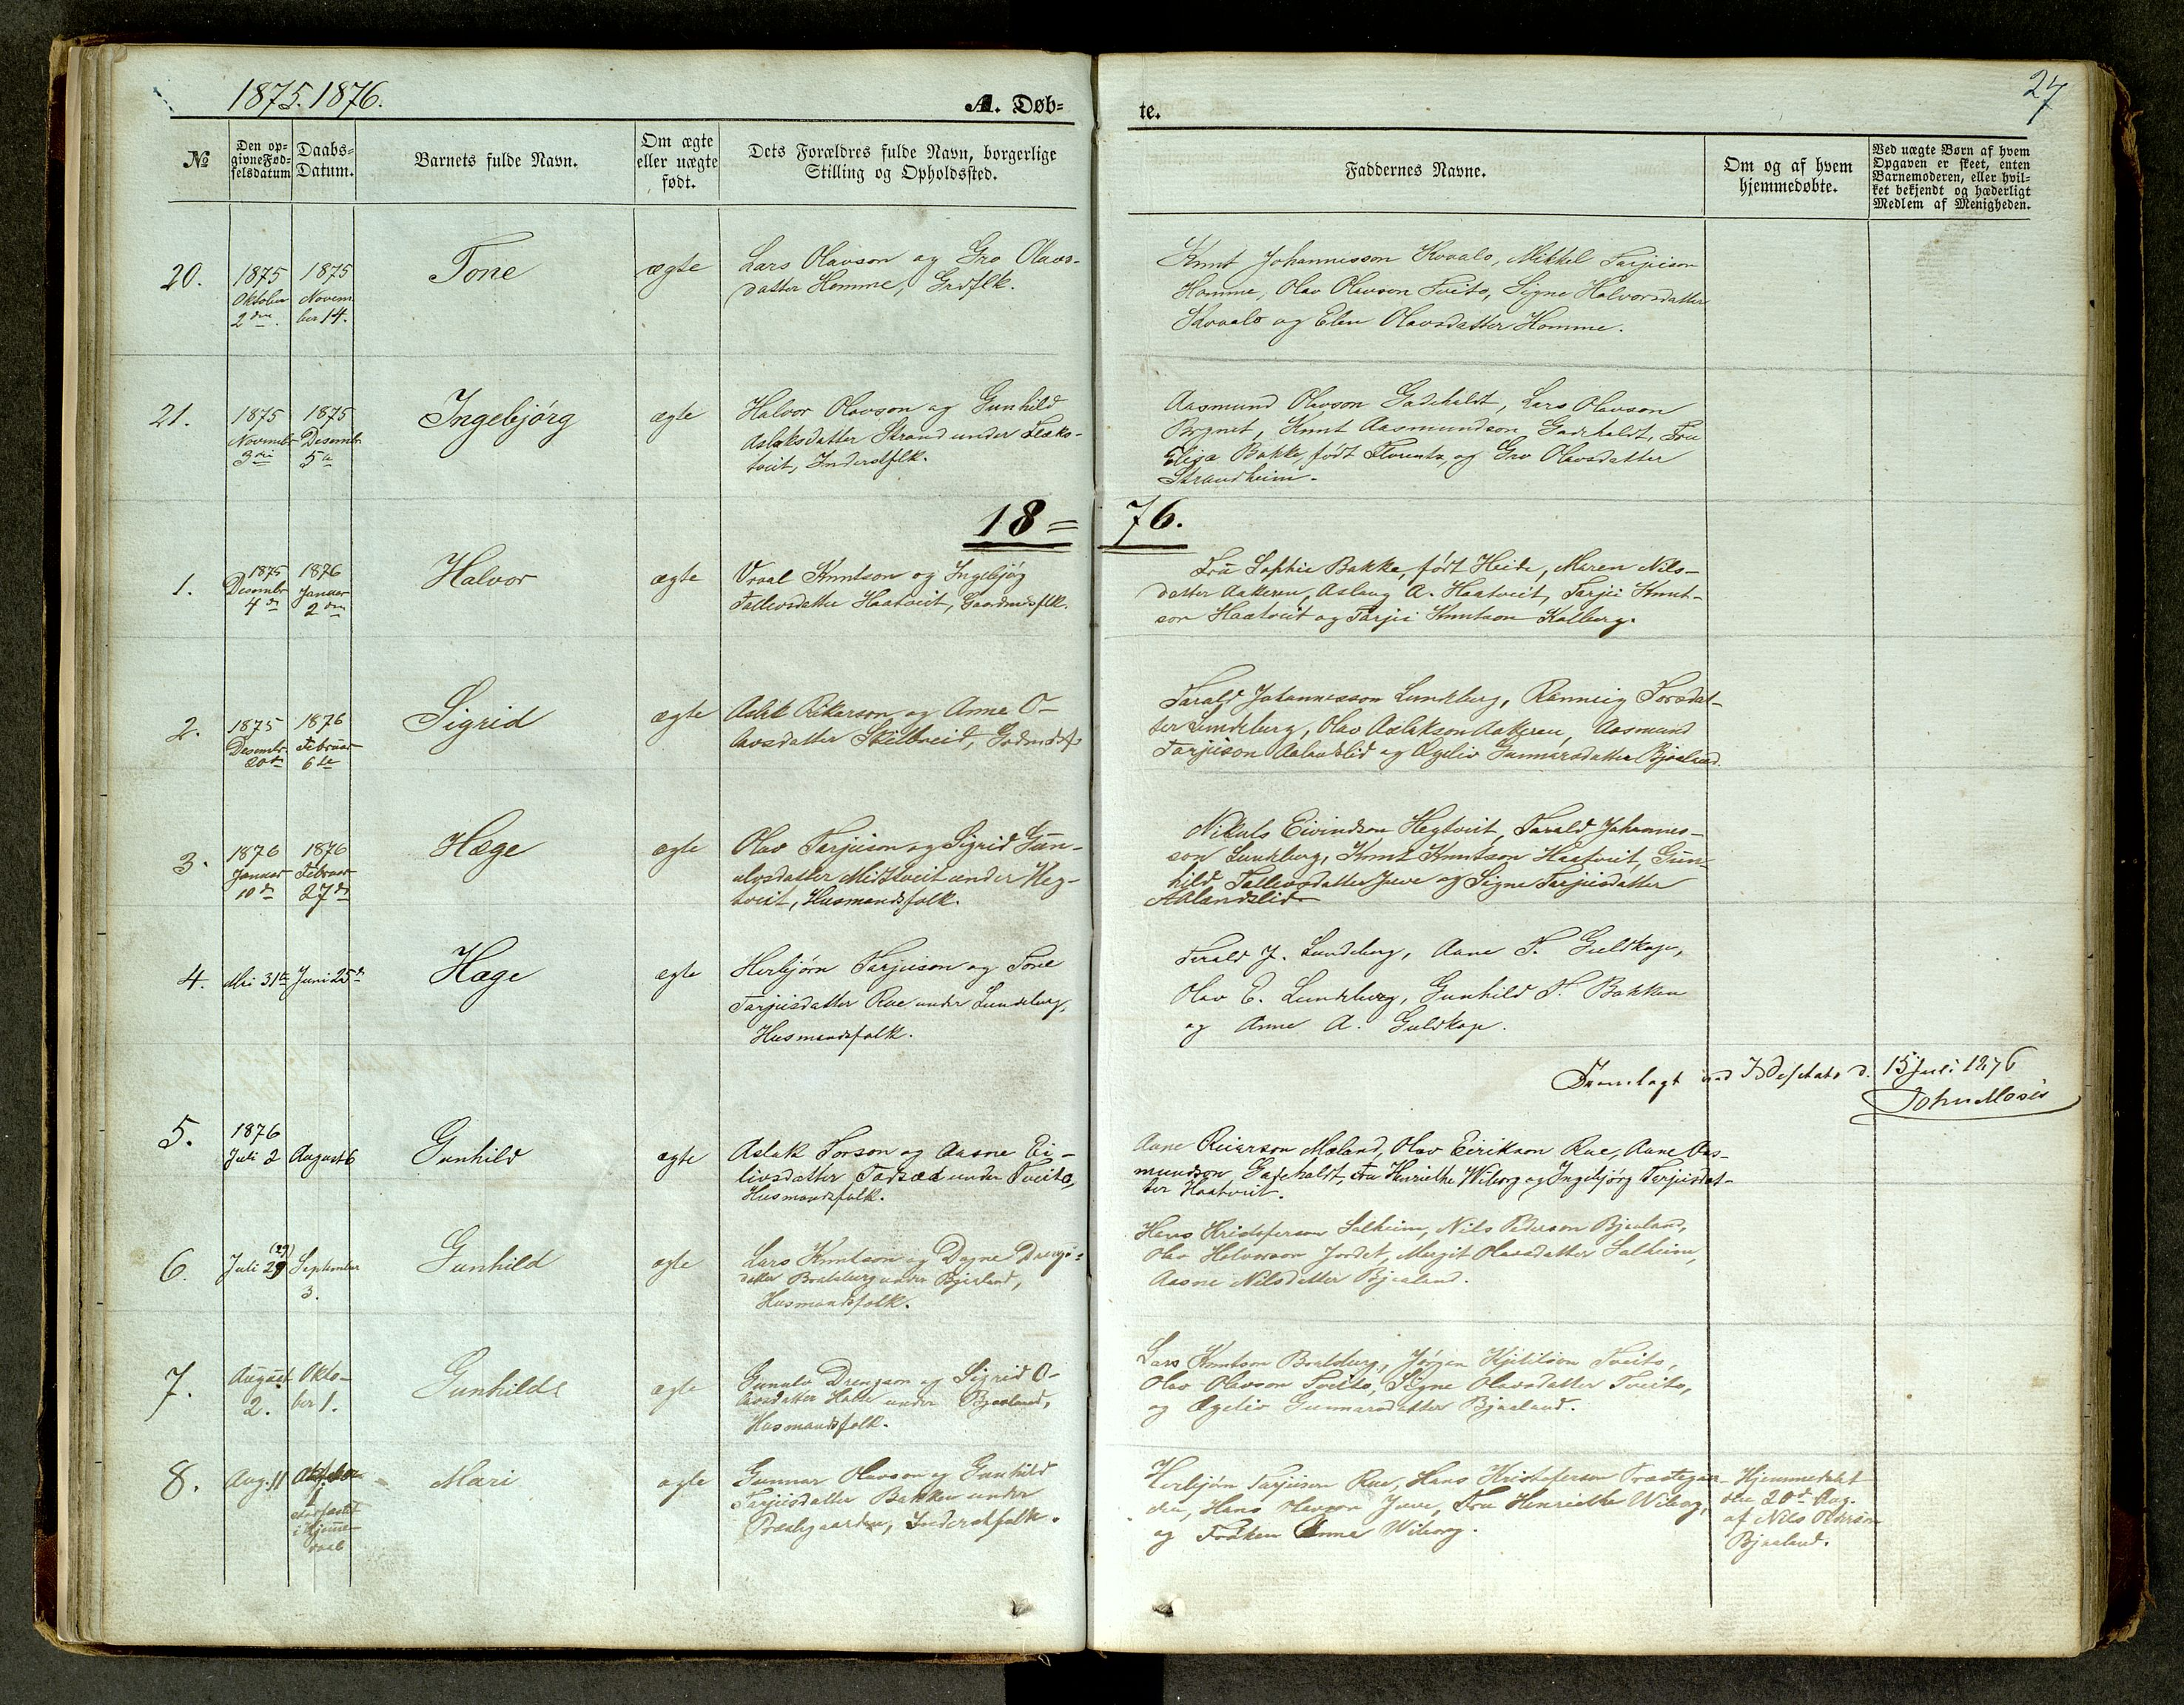 SAKO, Lårdal kirkebøker, G/Ga/L0002: Klokkerbok nr. I 2, 1861-1890, s. 27